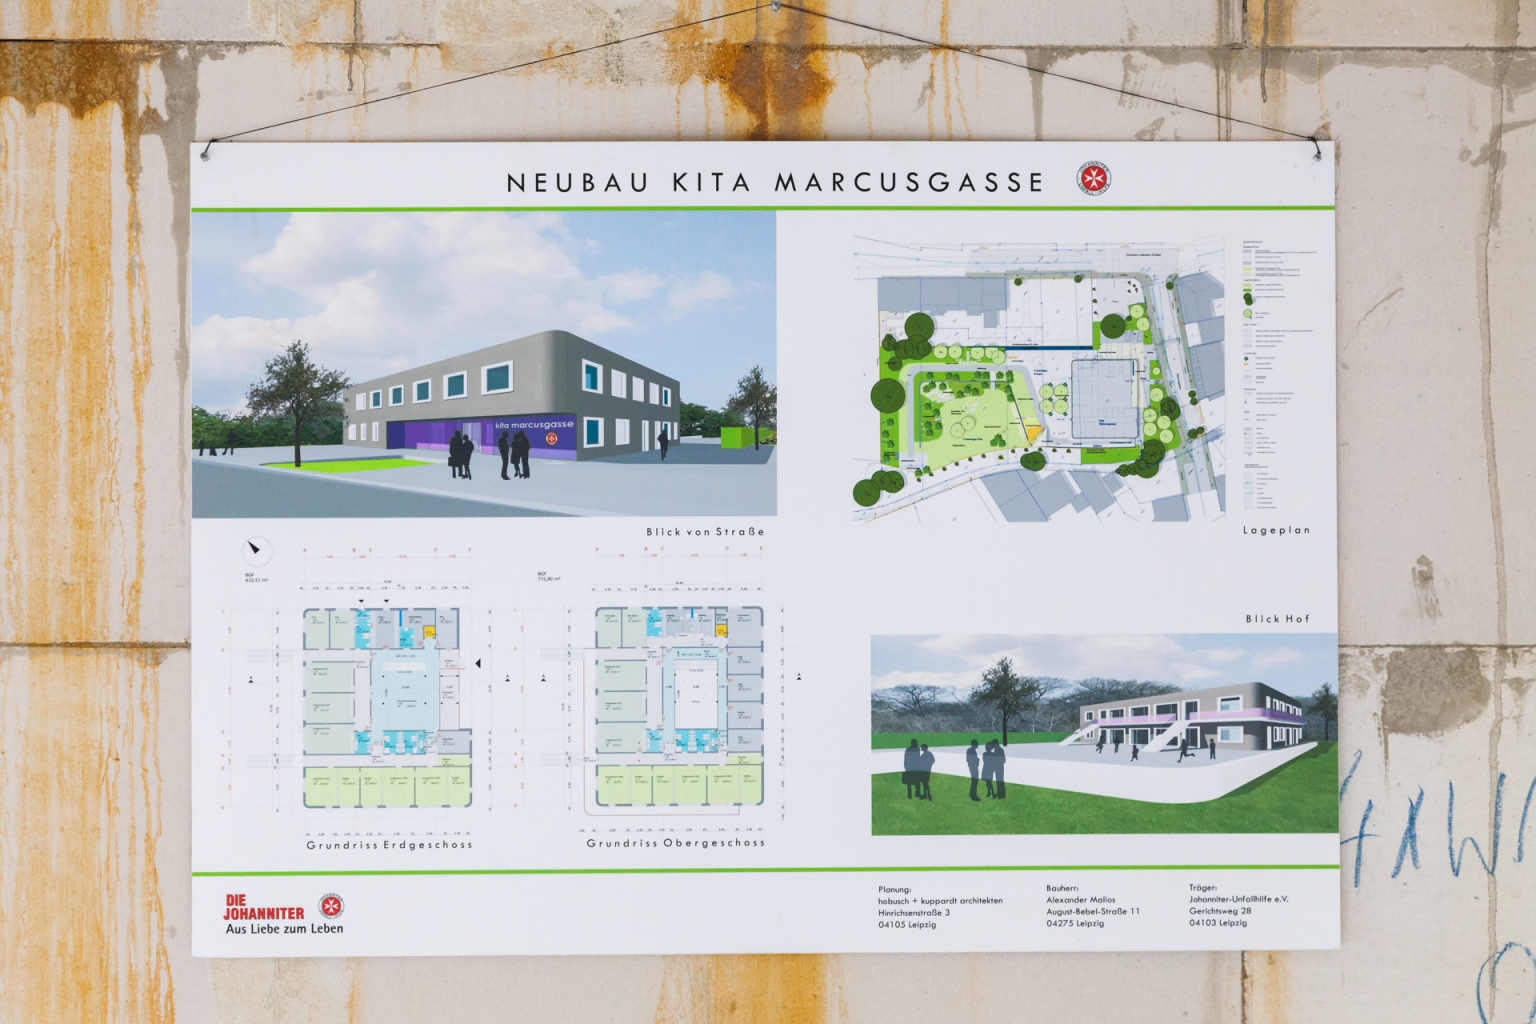 Familienzentrum Marcusgasse - Alexander Malios